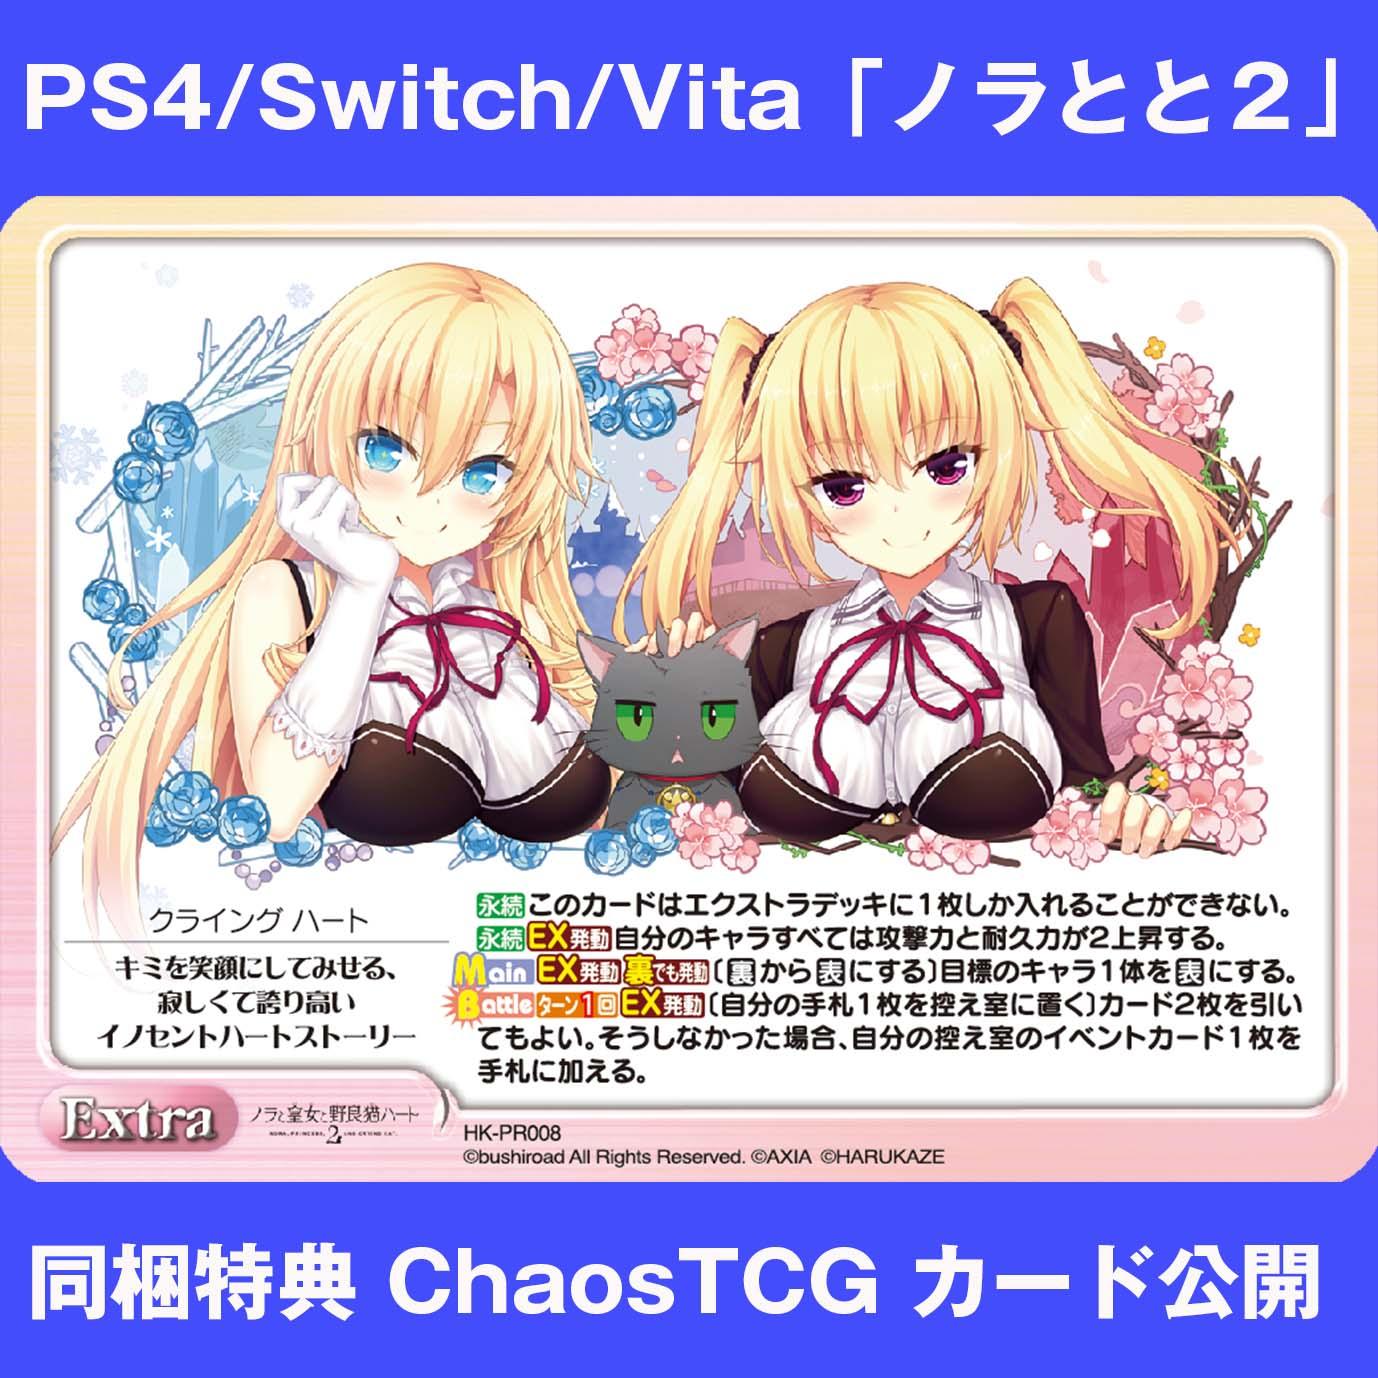 PS4/PS Vita/Switch版「ノラと皇女と野良猫ハート2」同梱特典ChaosTCG PRカードの絵柄を公開!